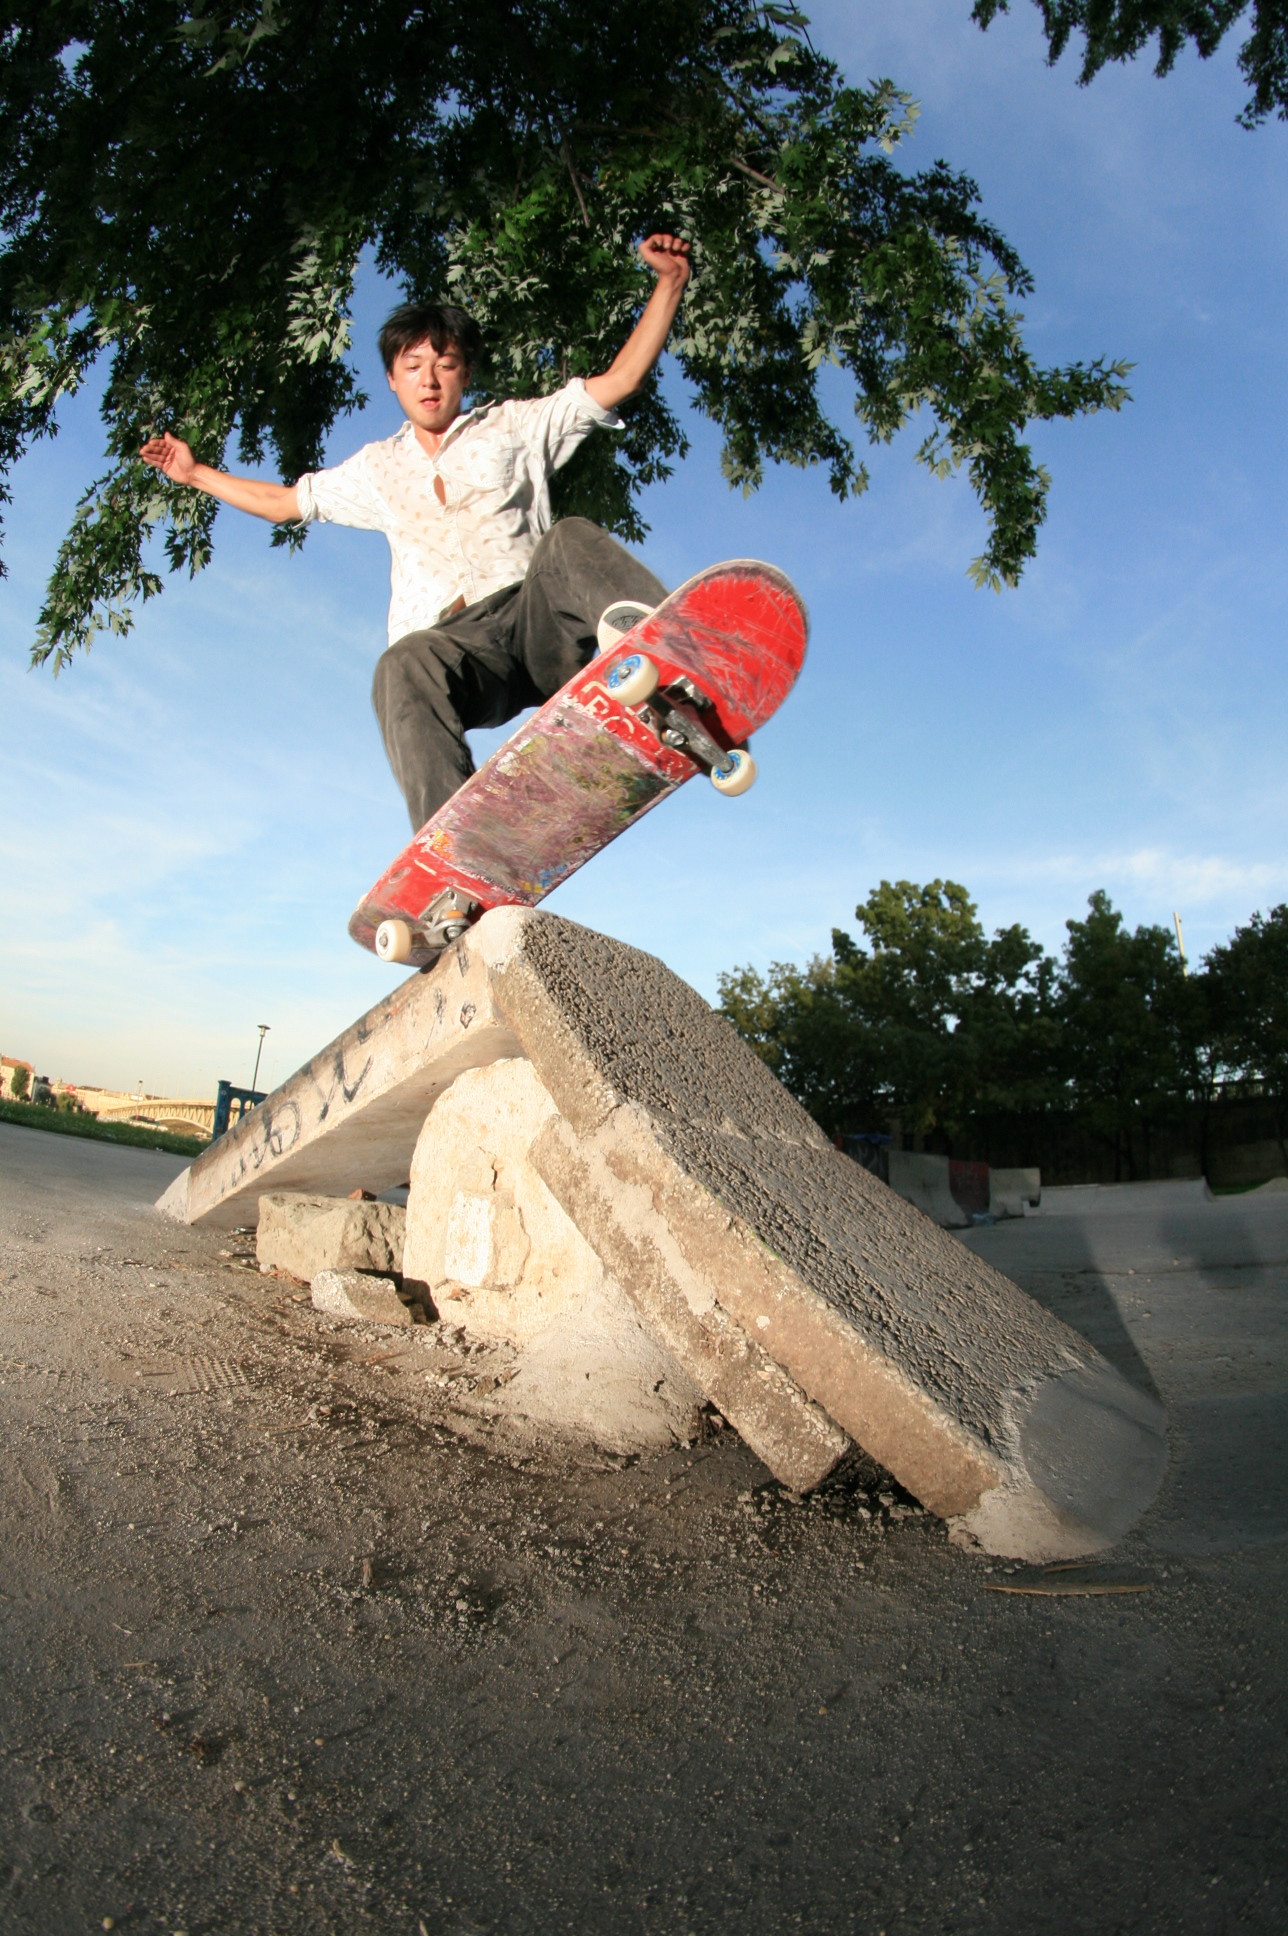 12f4868356b4 magenta-rios-skate-skateboards-skateboard-interview-fs-rock-